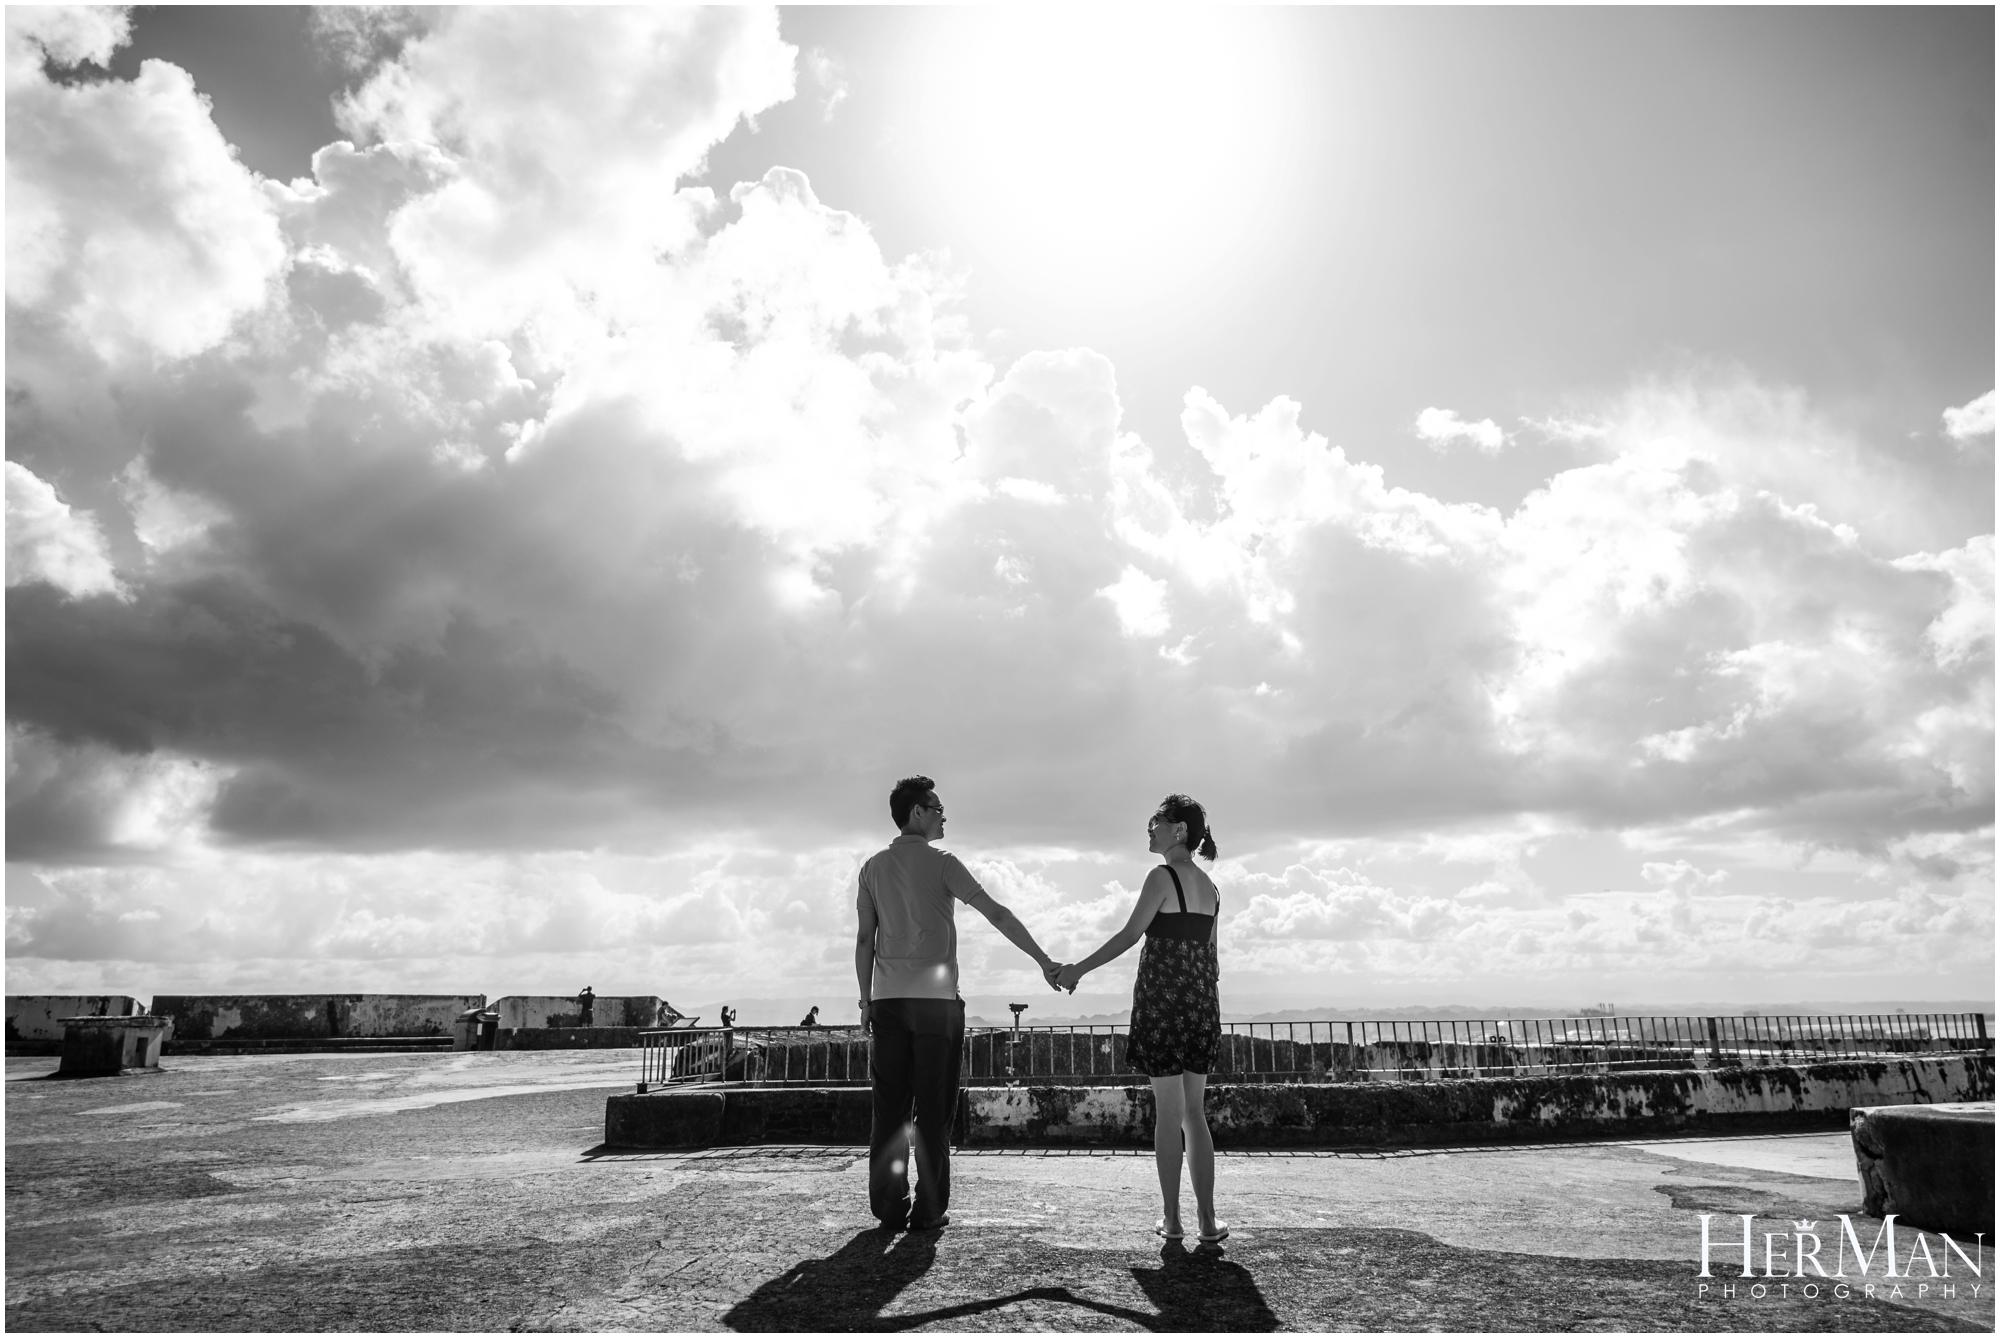 disney-fantasy-cruise-wedding-HerMan-photography_0052.jpg